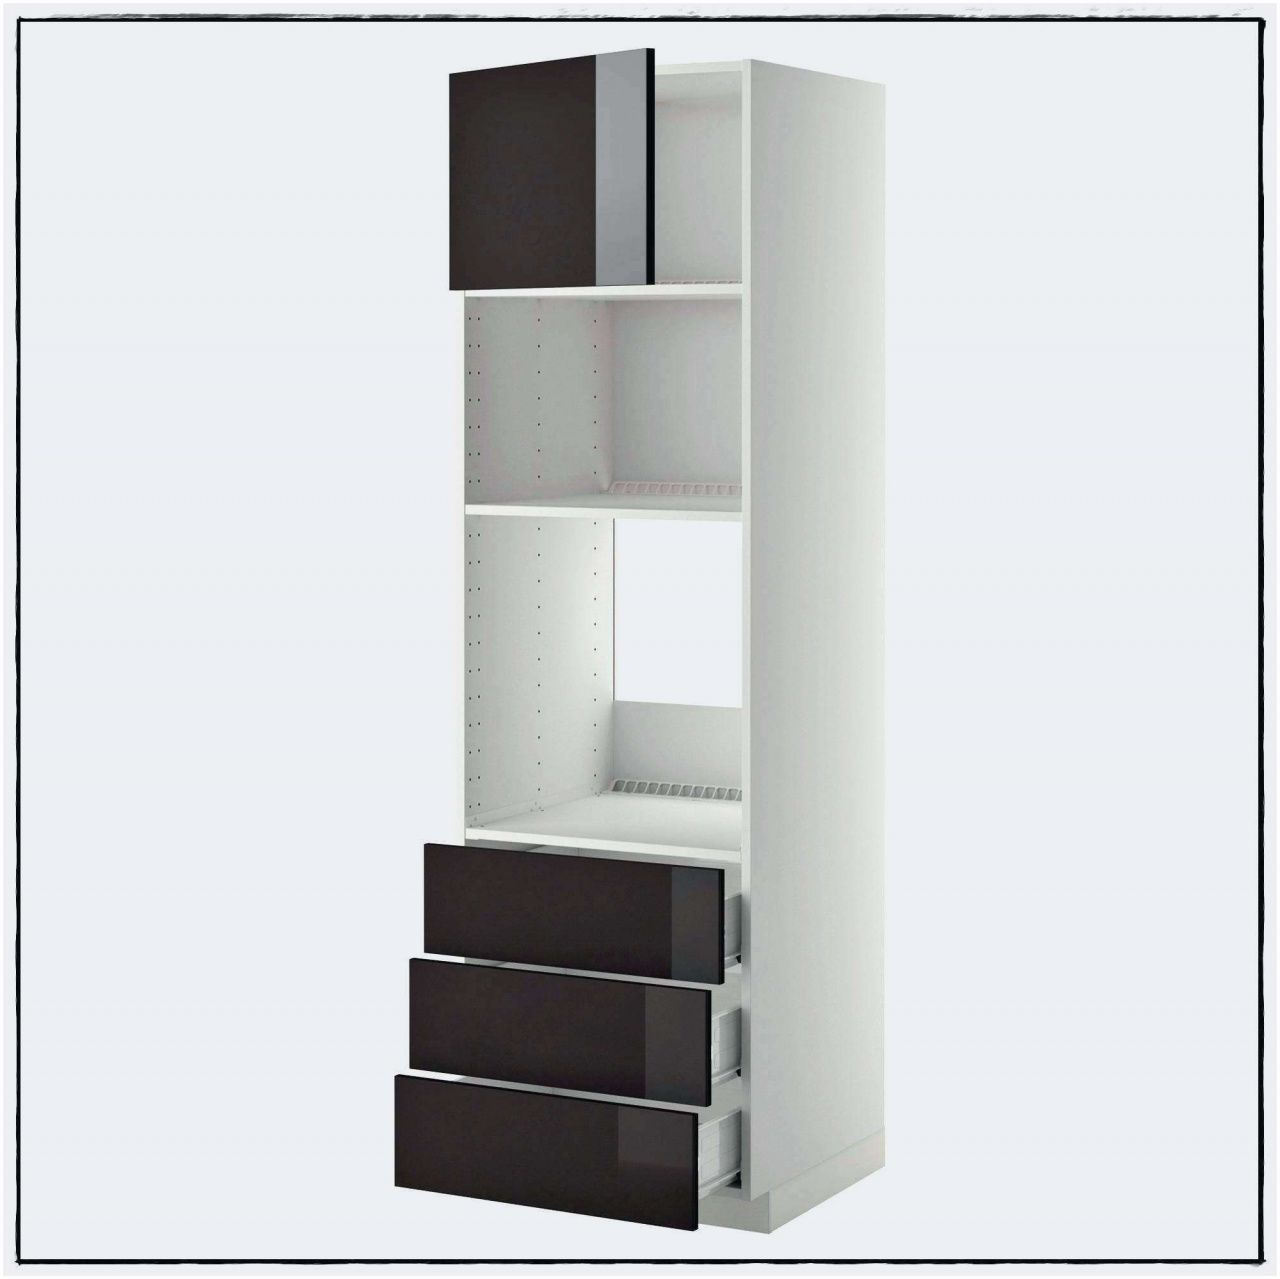 77 Meuble Bas De Cuisine Pas Cher Black Dressing Tables Tall Cabinet Storage Ikea Vanity Table